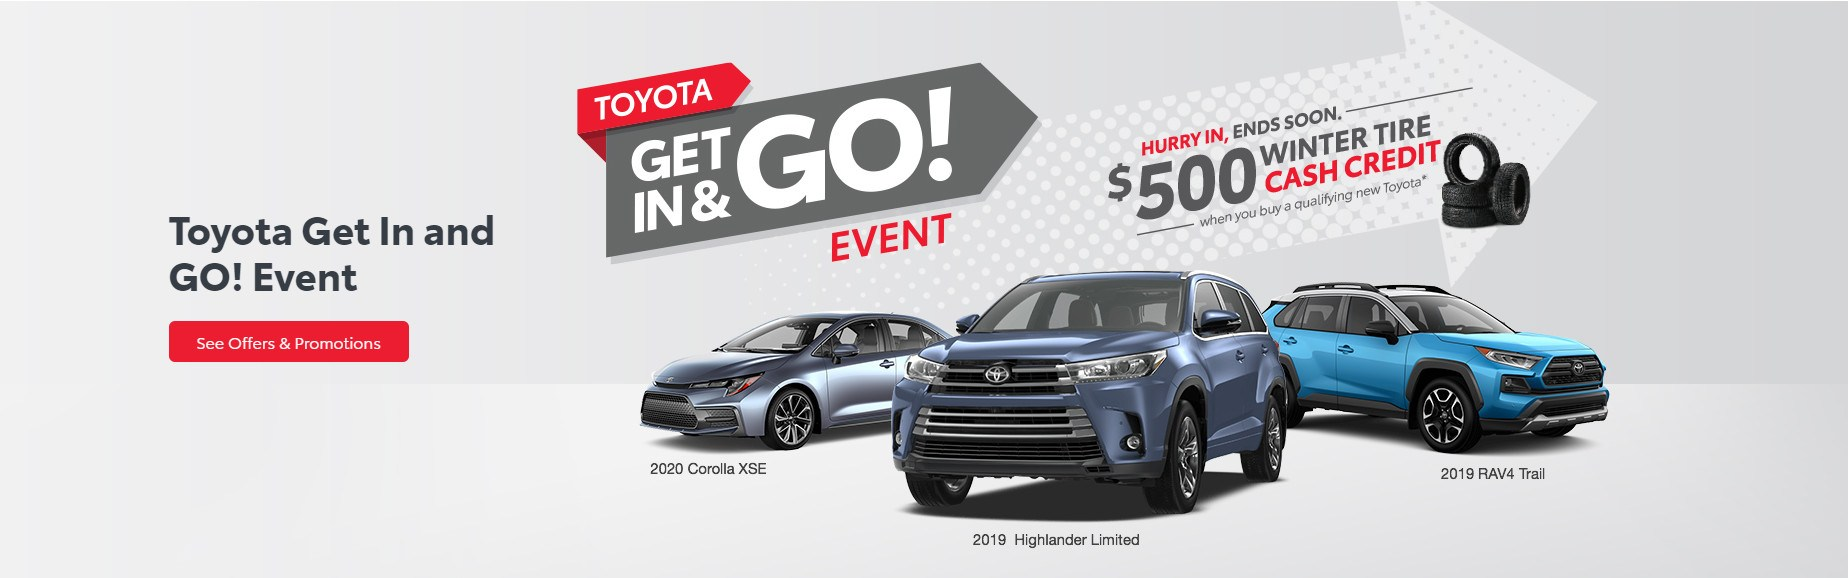 Ken Shaw Toyota 2019 2020 Toyota on sale in Toronto